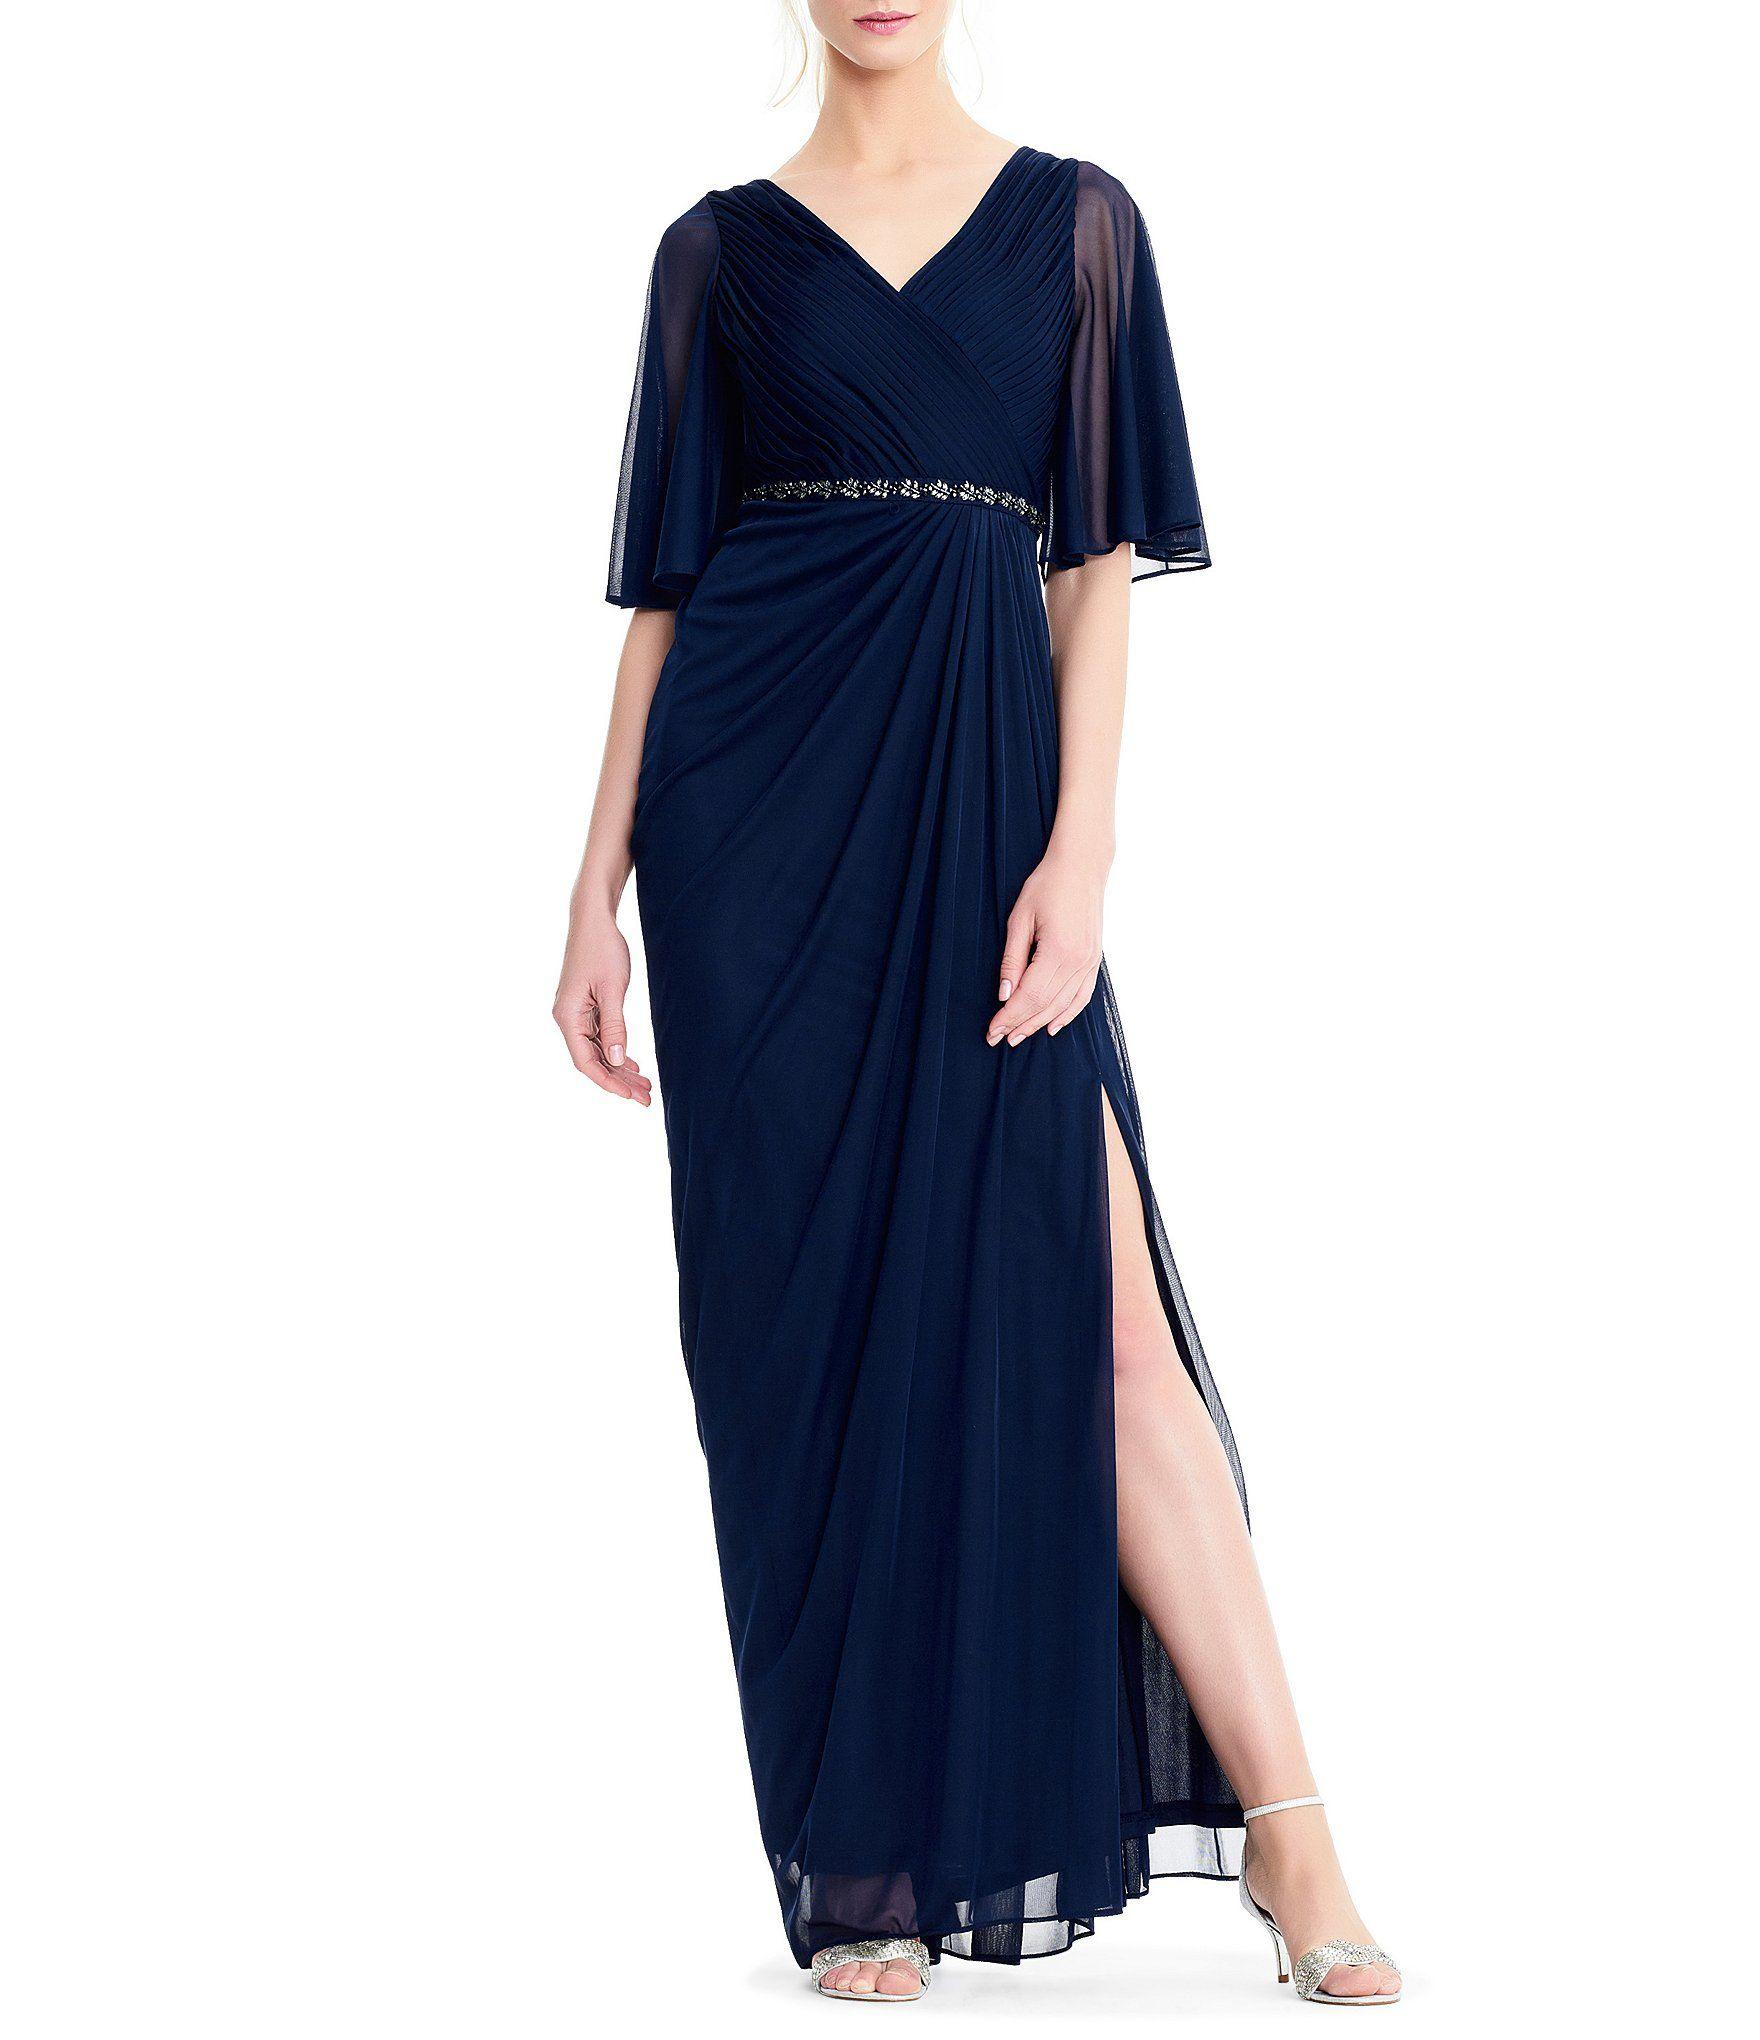 Adrianna Papell Draped Stretch Tulle Short Sleeve Dress Dillards Women Wedding Guest Dresses Dresses Evening Wedding Guest Dresses [ 2040 x 1760 Pixel ]